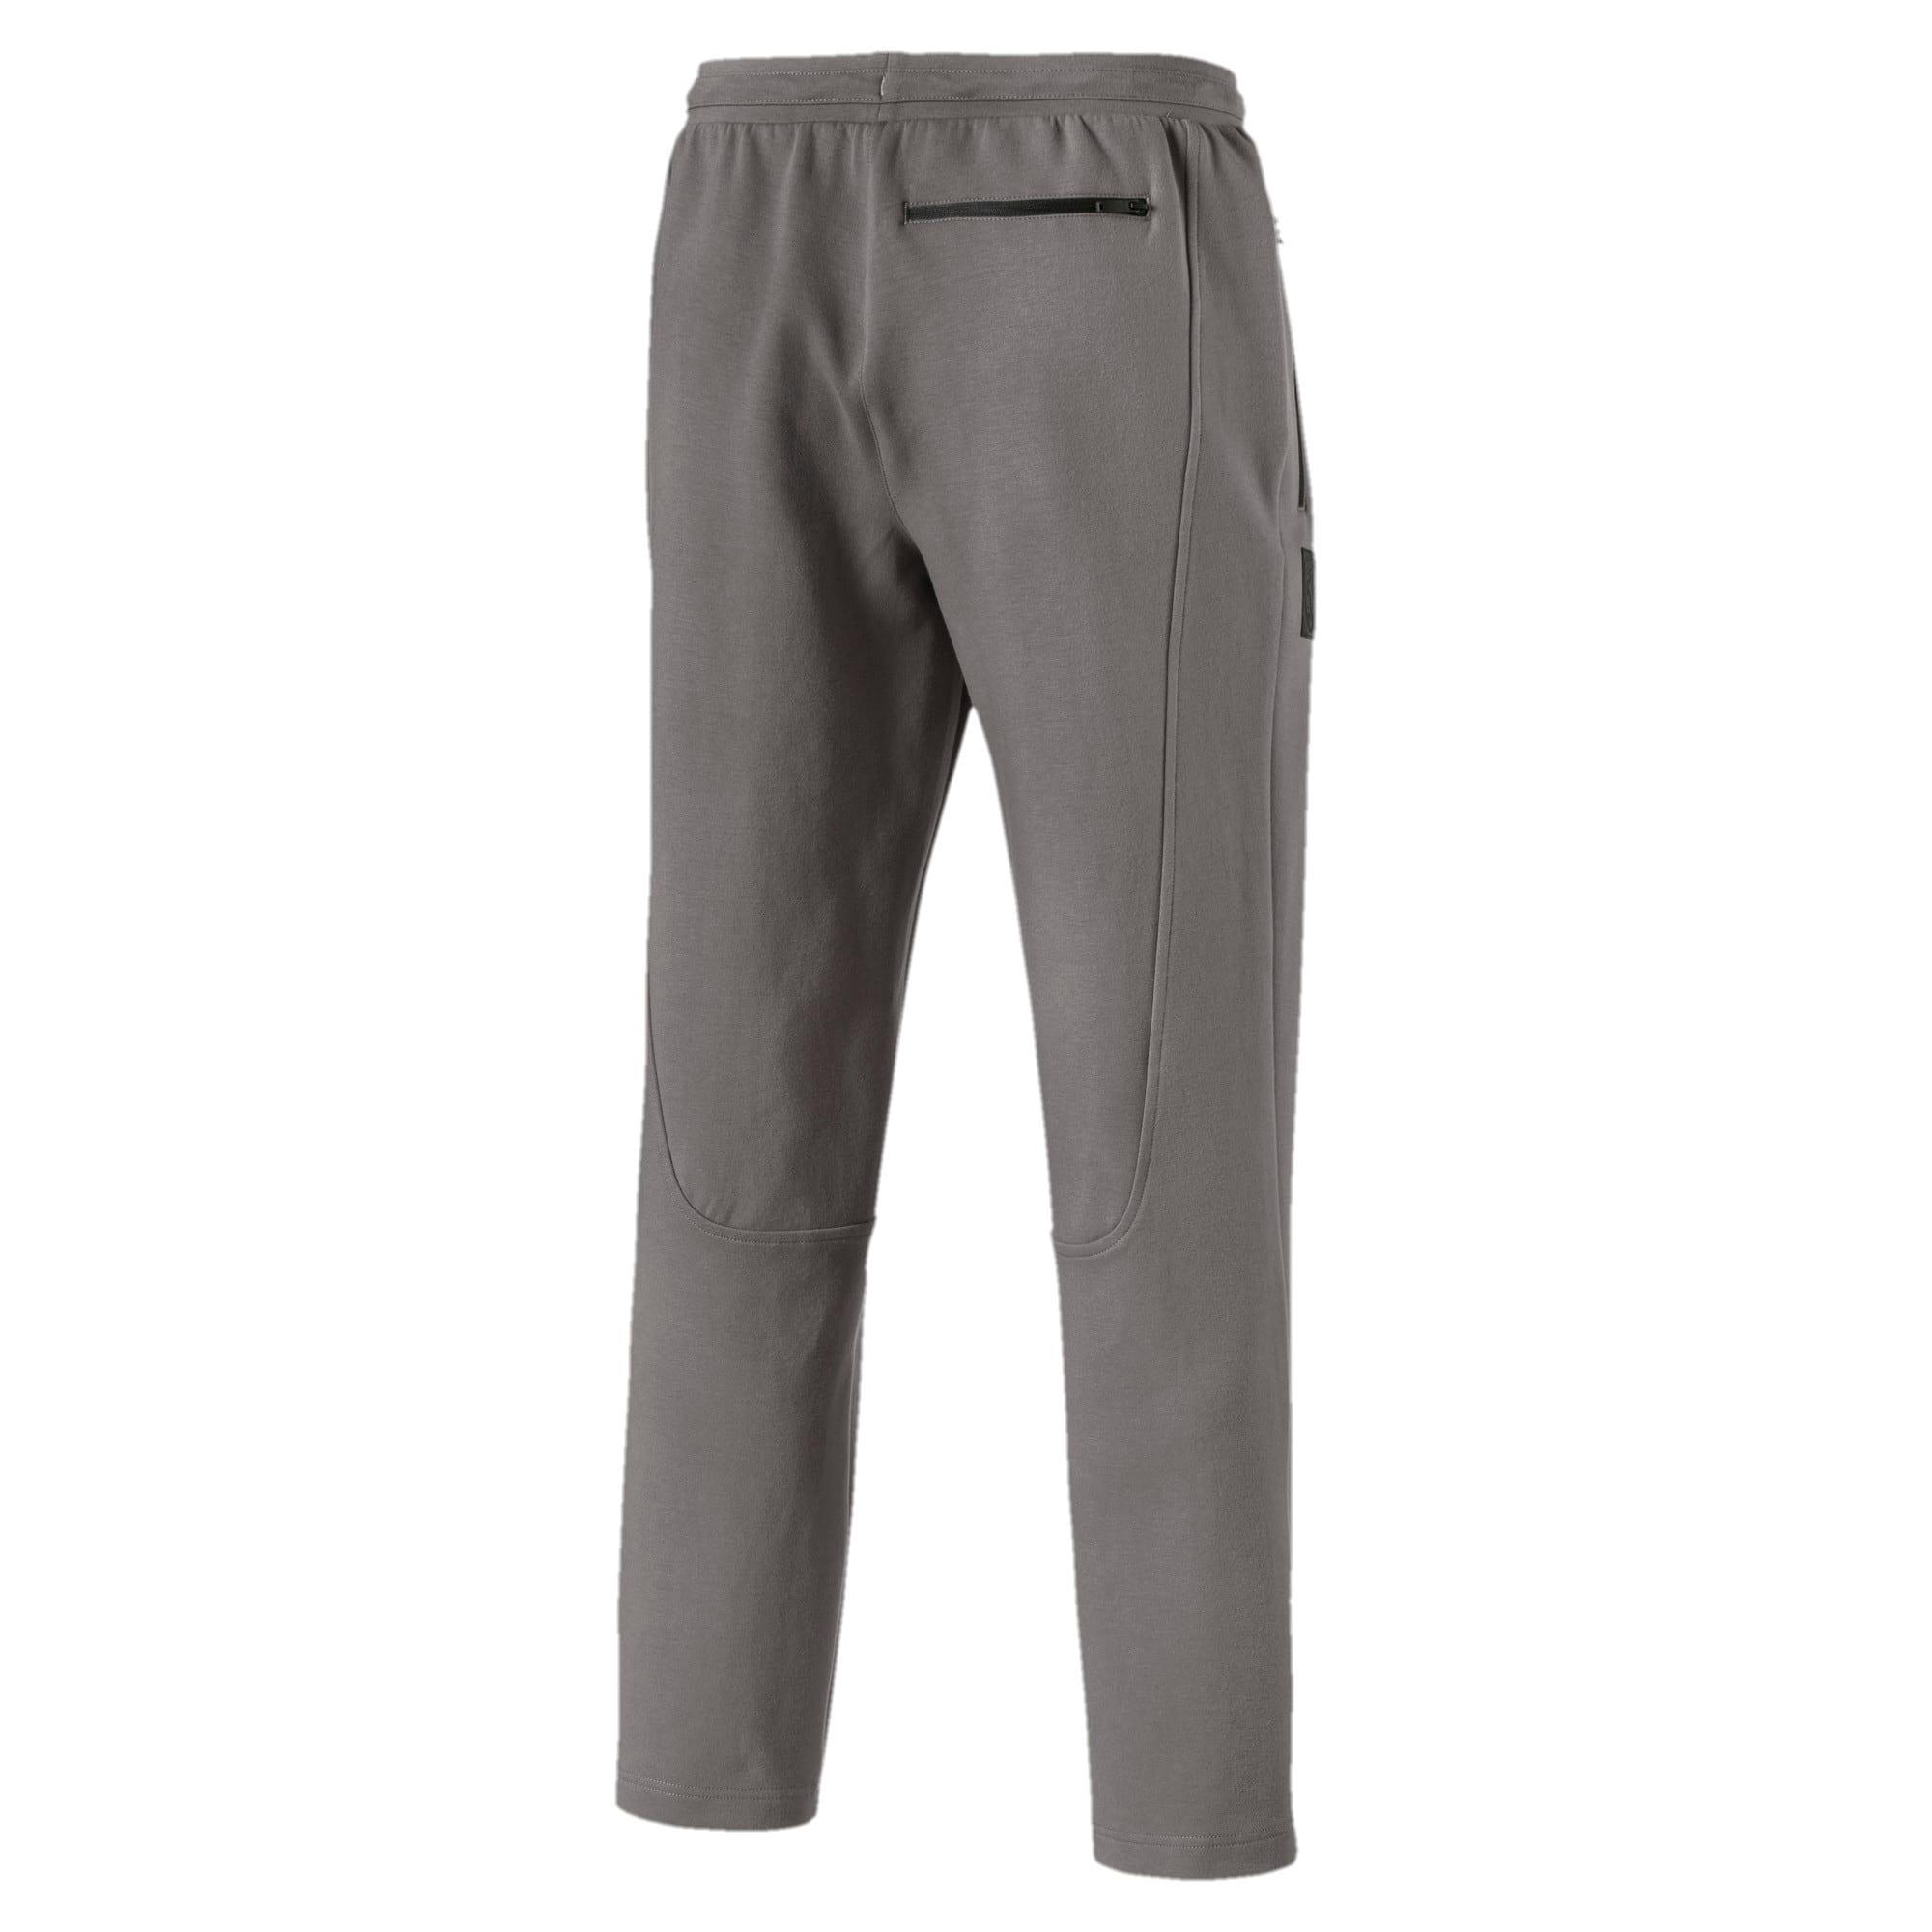 Thumbnail 3 of Ferrari OC Men's Sweat Pants, Charcoal Gray, medium-IND